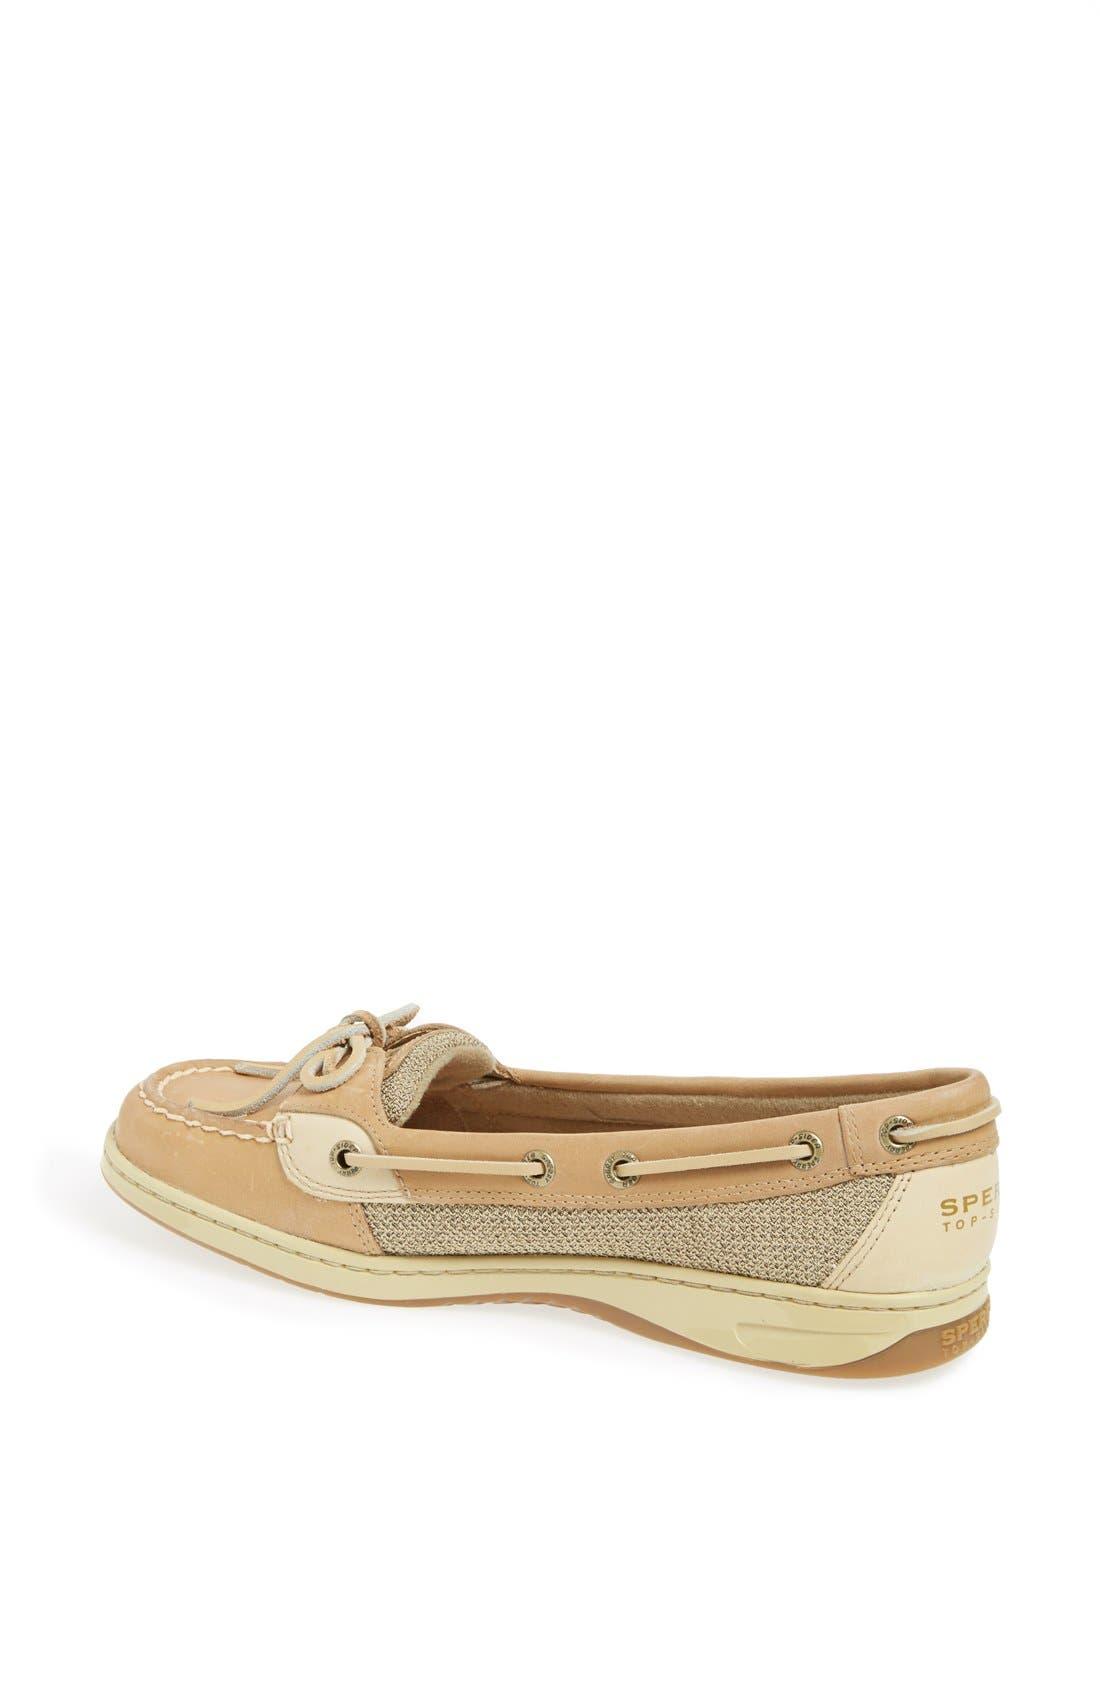 Alternate Image 2  - Sperry 'Angelfish' Boat Shoe (Women)